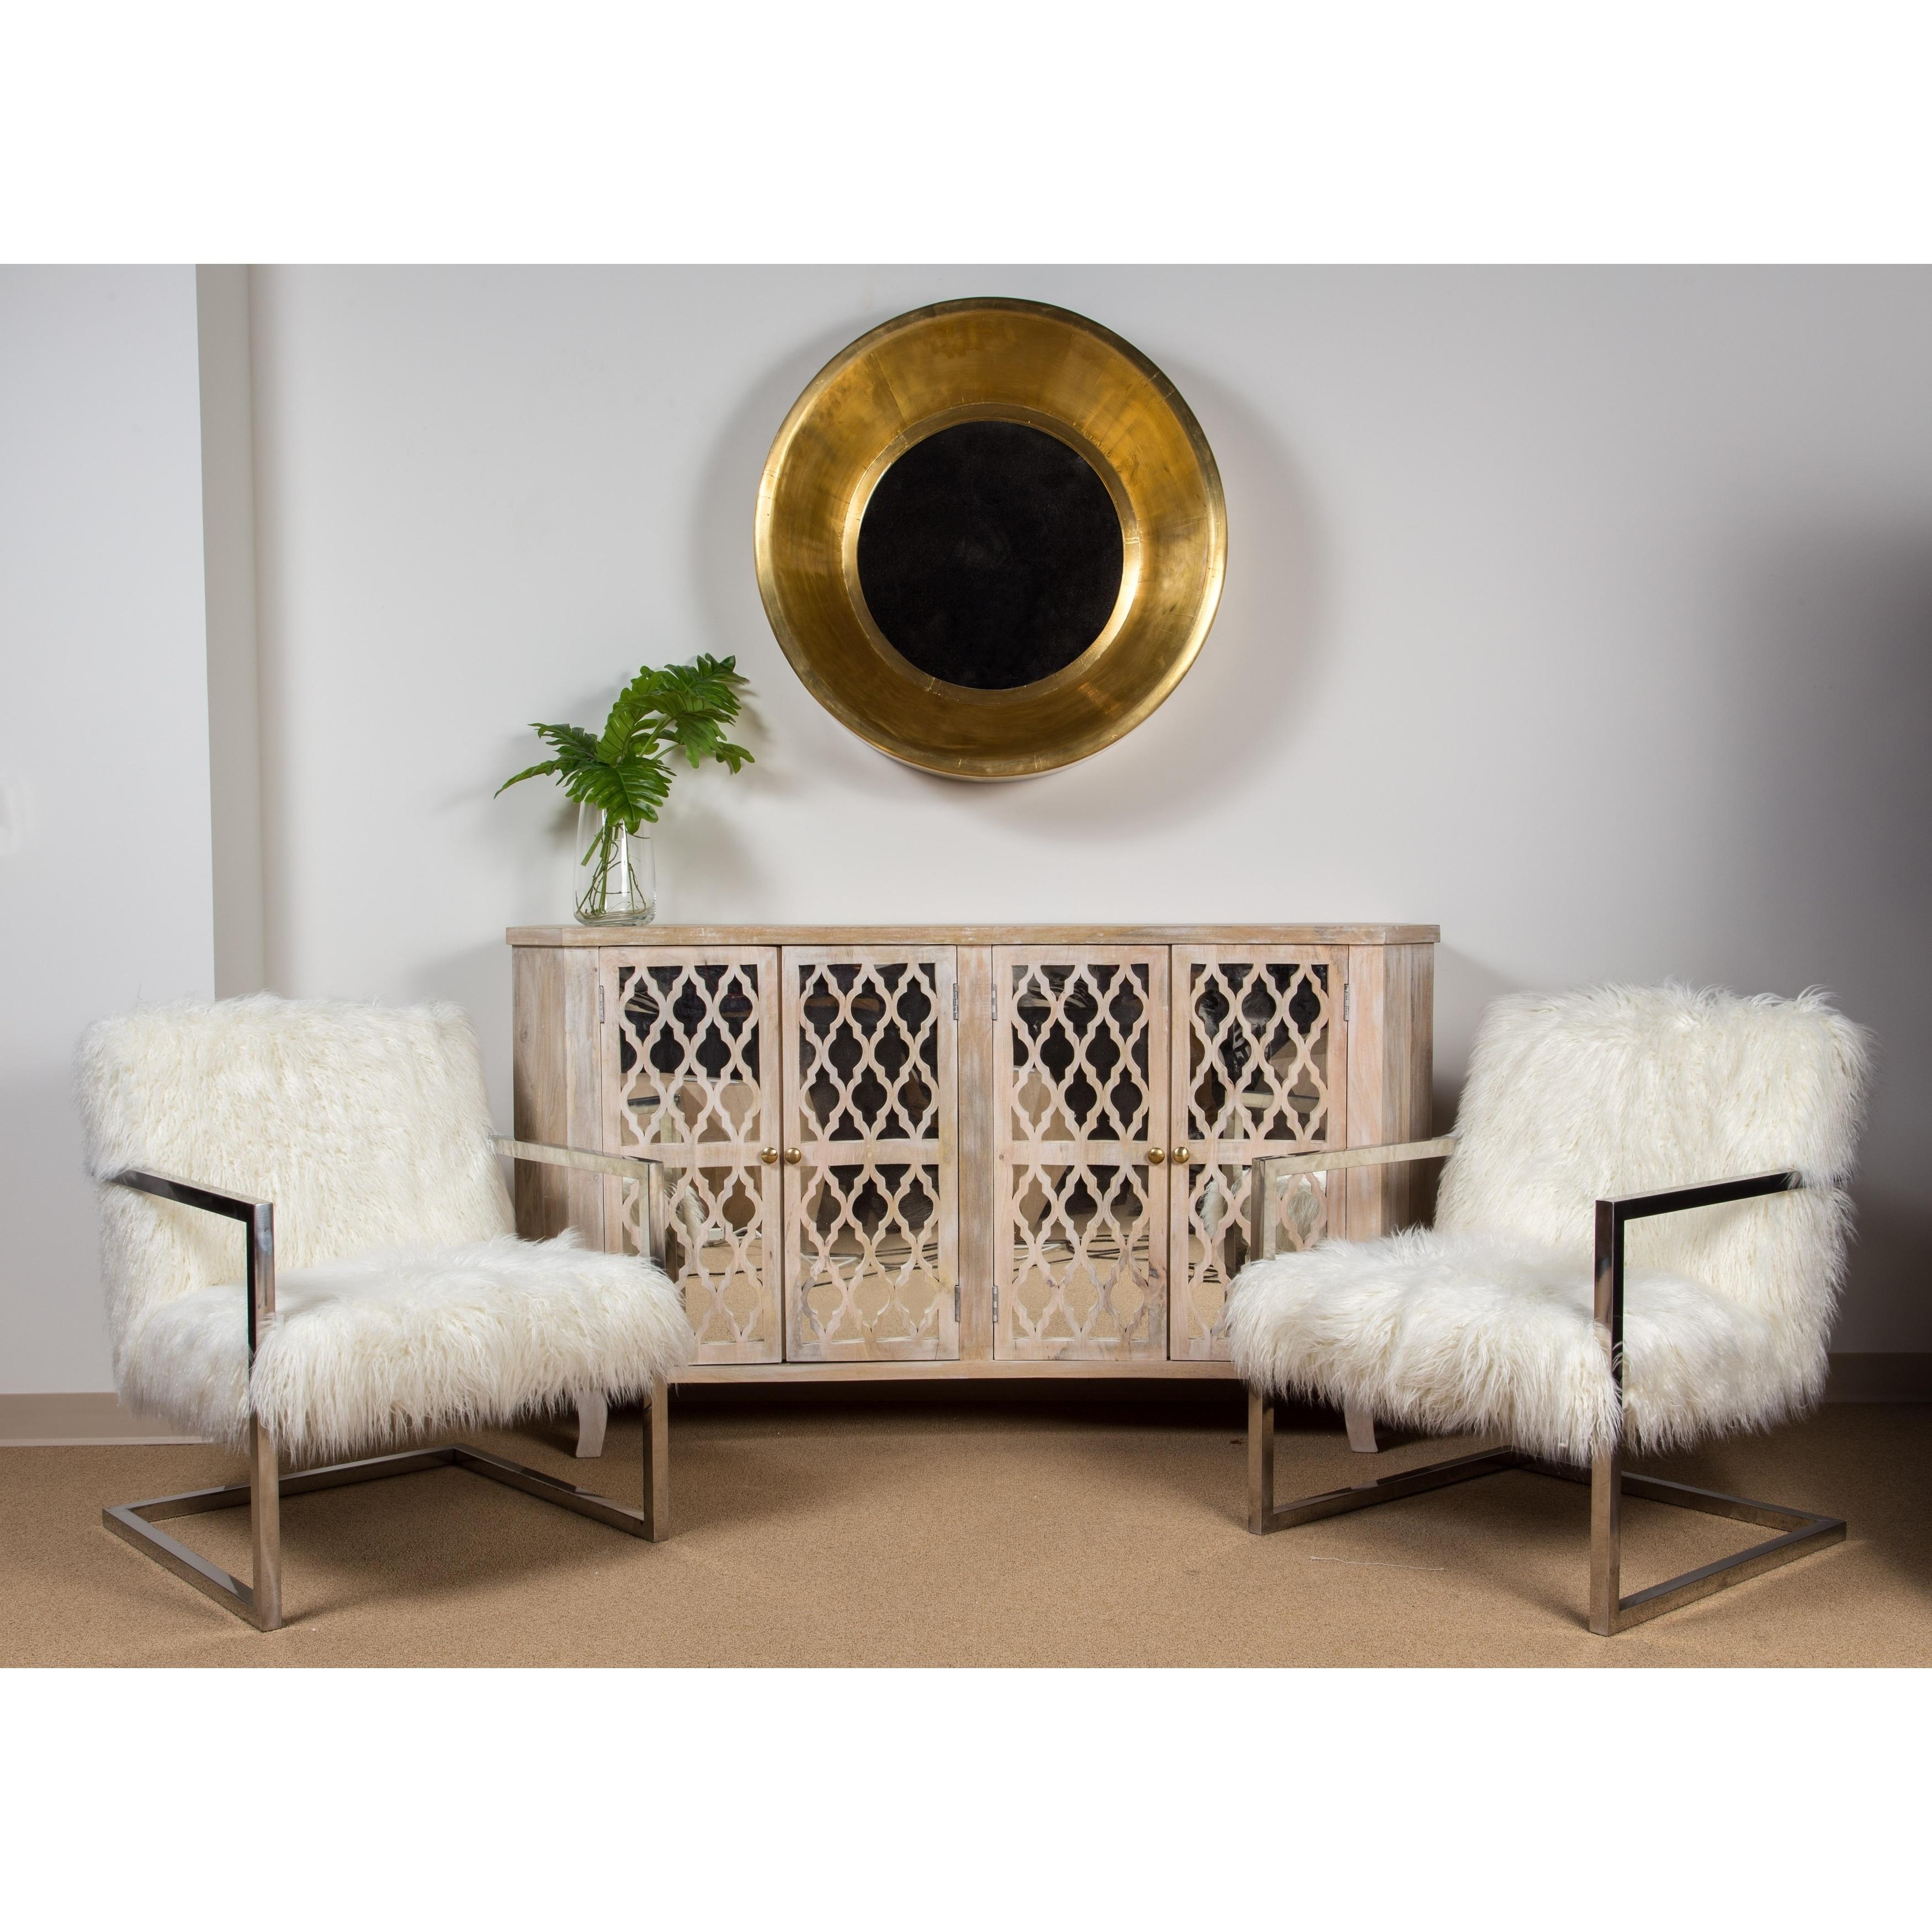 Stupendous Porter Designs Zsa Zsa Faux Llama Fur Metal Accent Chair 34H X 25D X 25W Andrewgaddart Wooden Chair Designs For Living Room Andrewgaddartcom